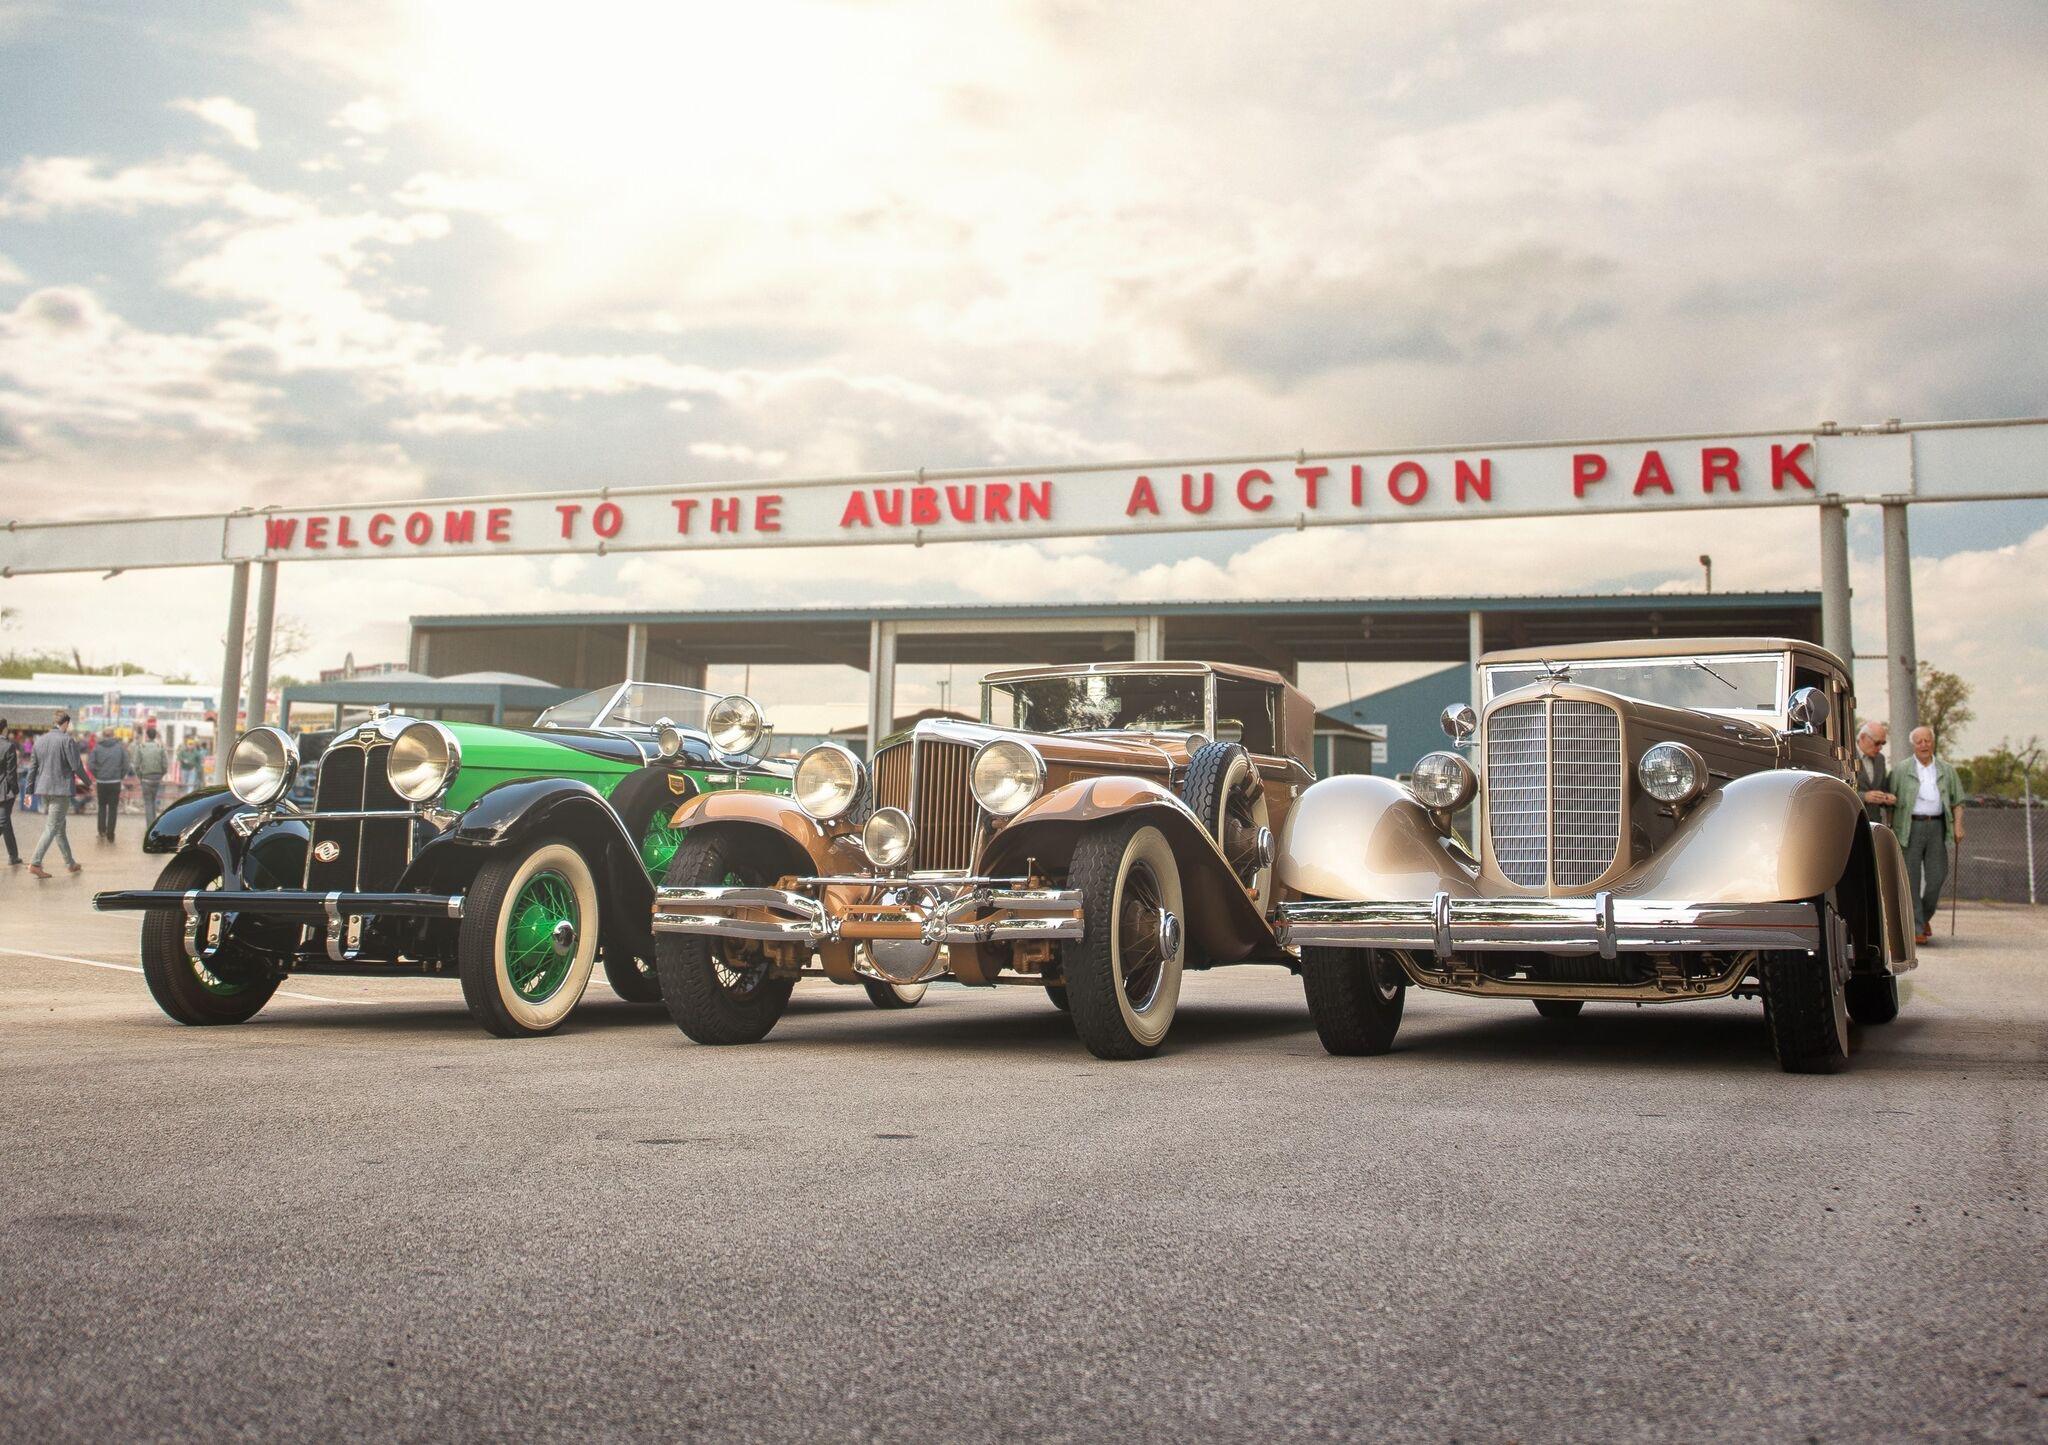 Auburn, Will RM's Auburn Fall auction be the last at the historic location?, ClassicCars.com Journal